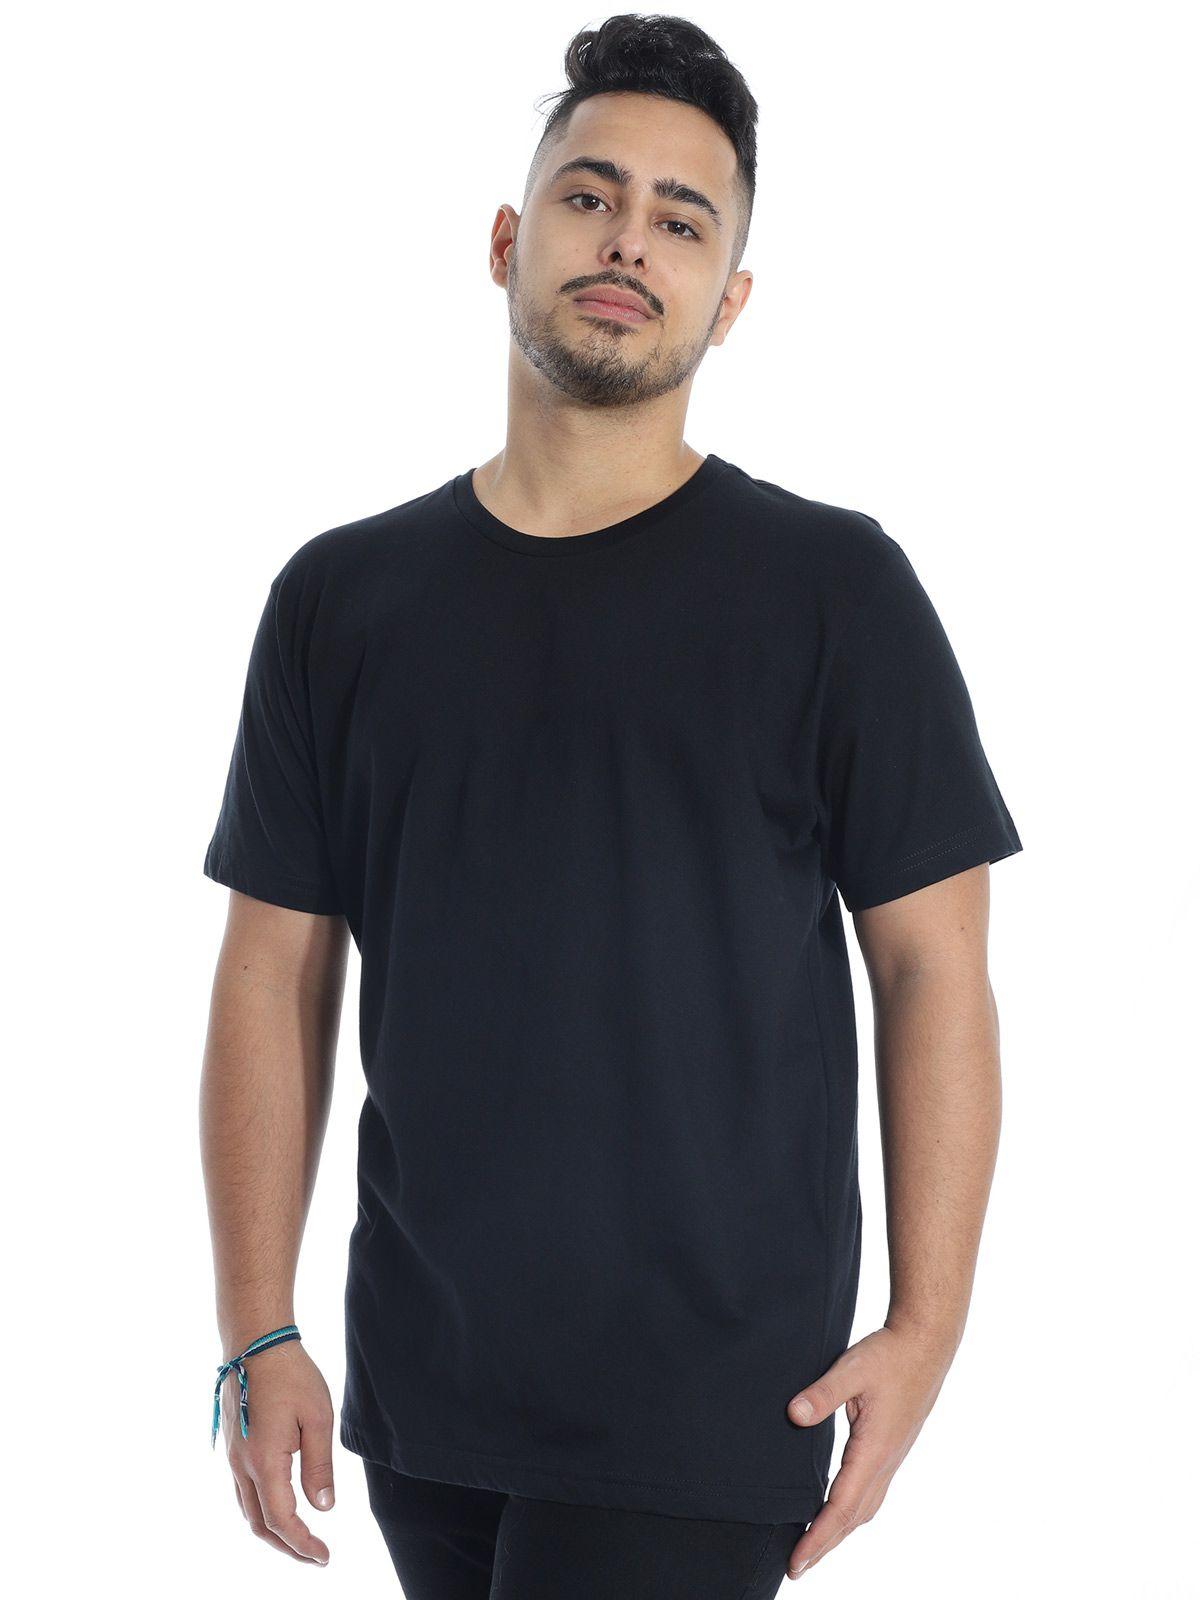 Camiseta Anistia Básica Lisa Preto